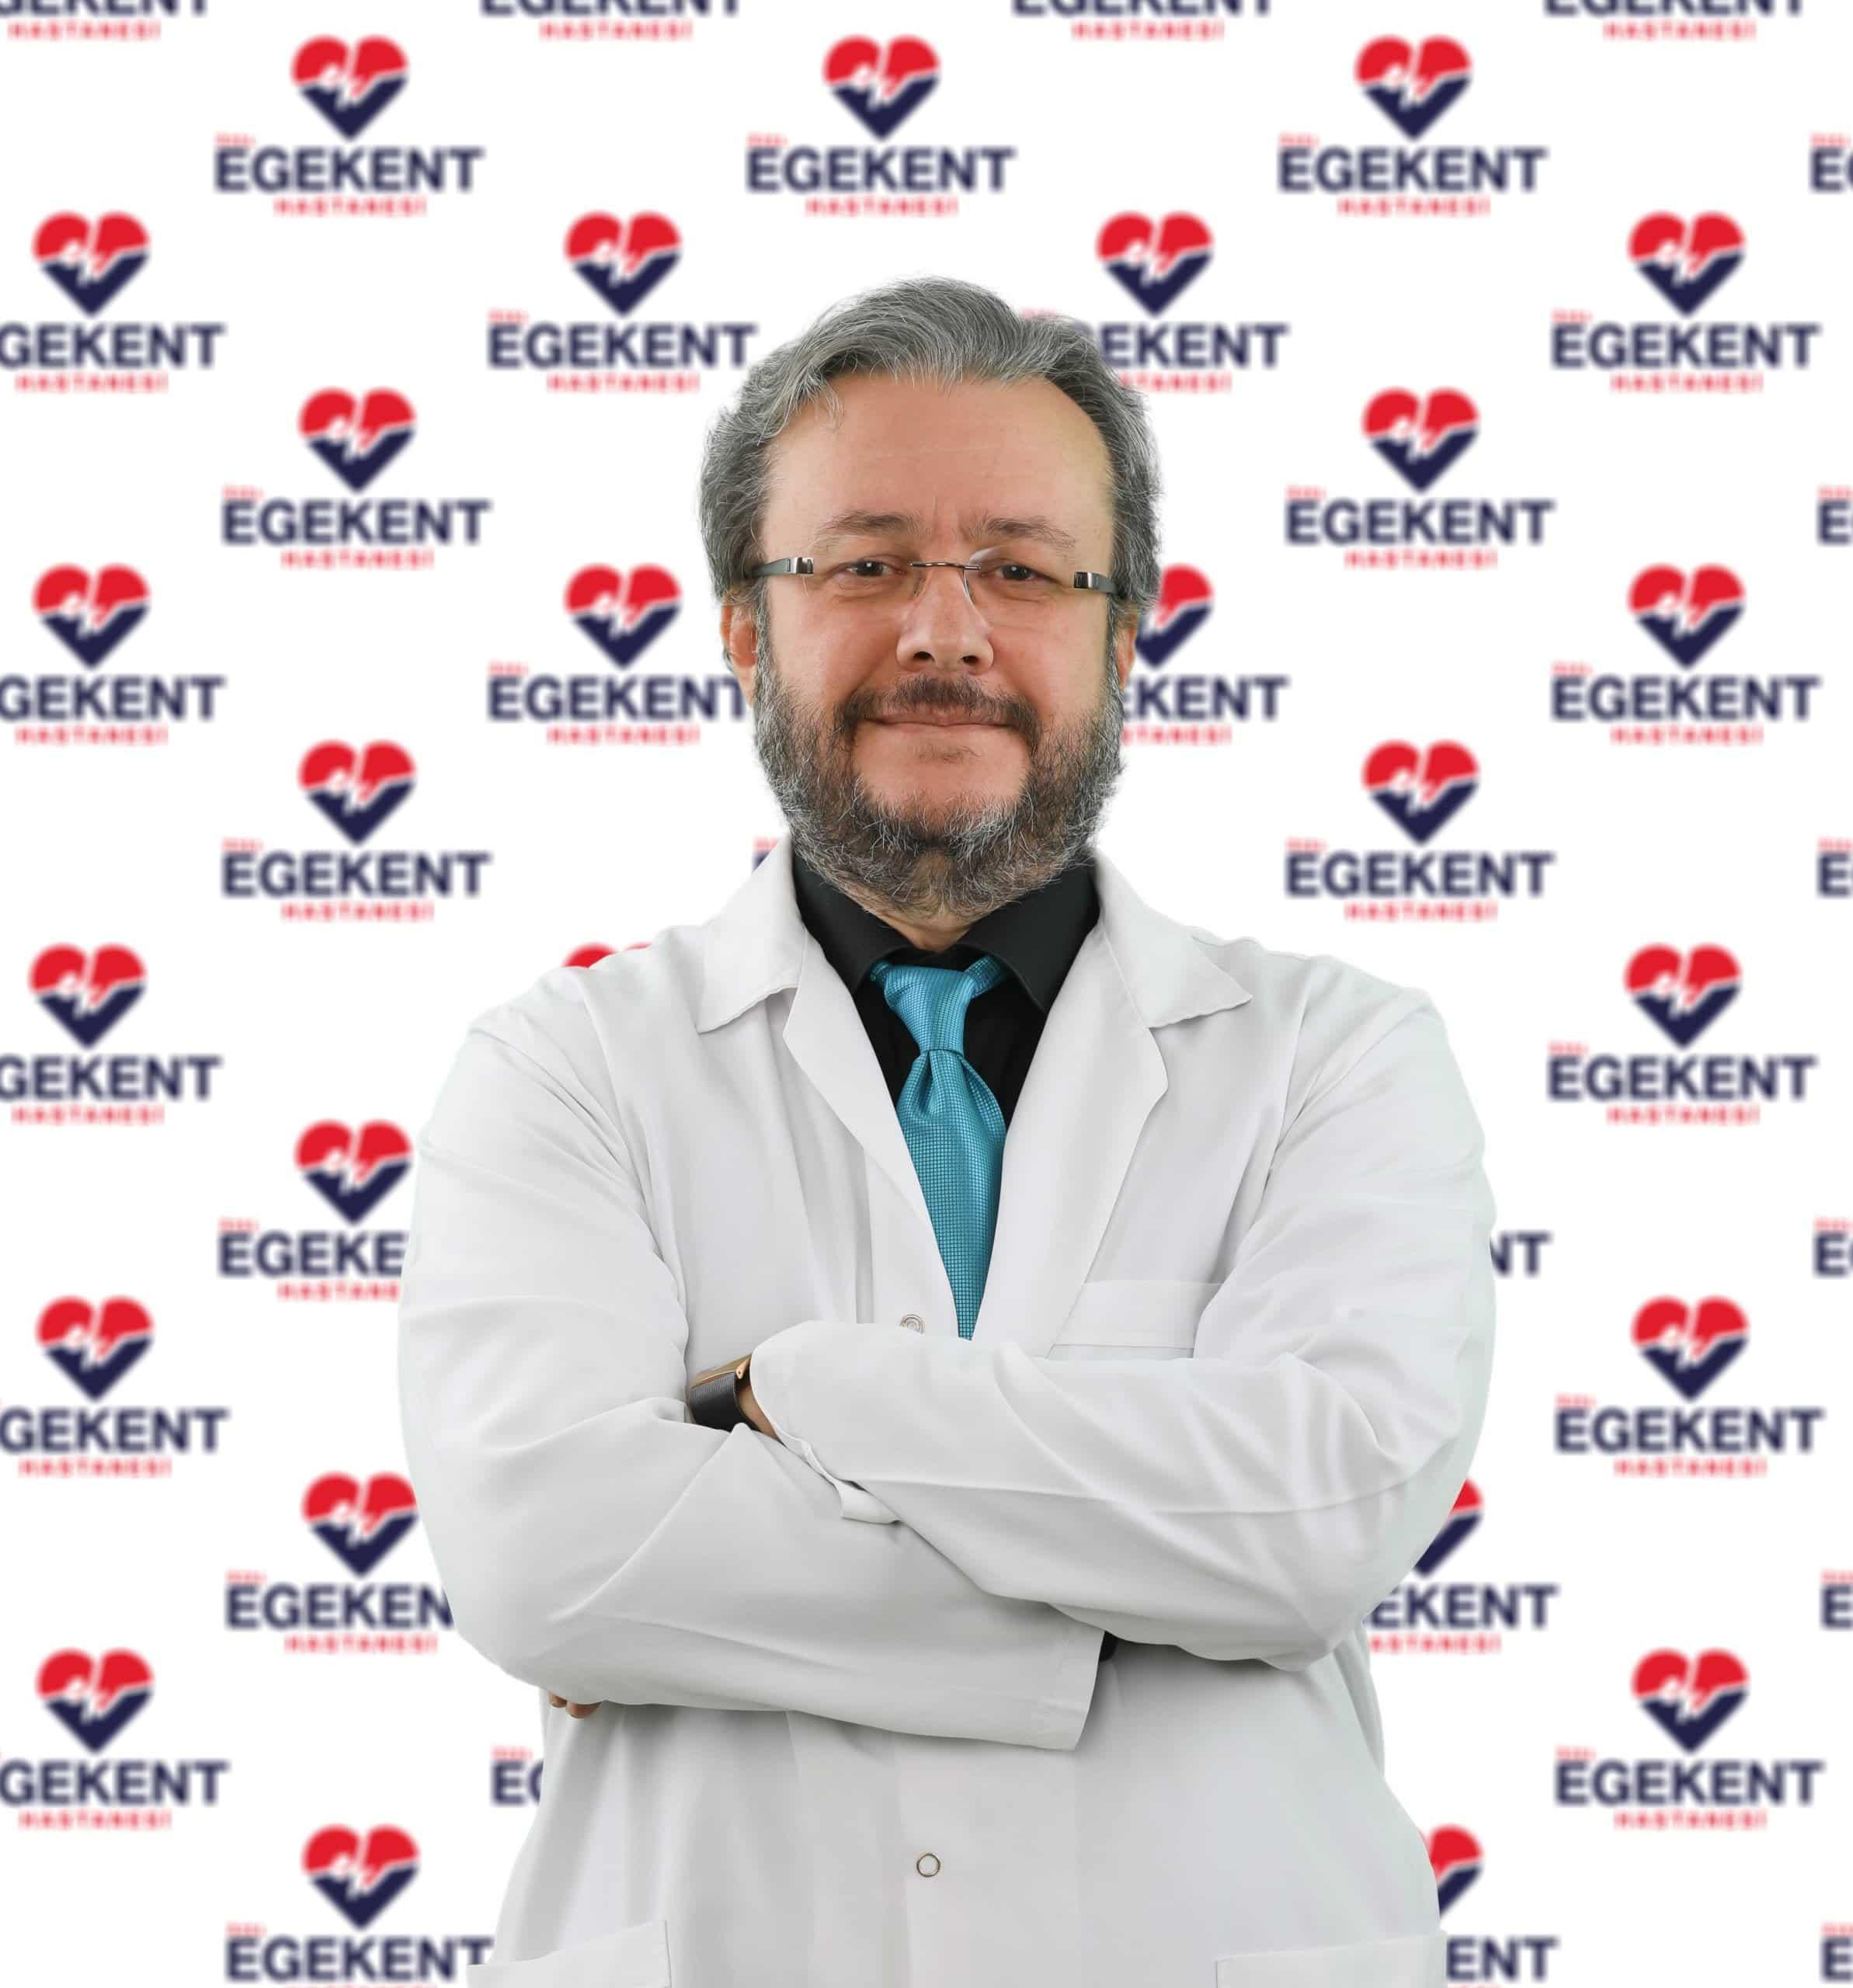 Denizli Özel Egekent Hastanesi Uzm. Dr. Ahmet BİLGE